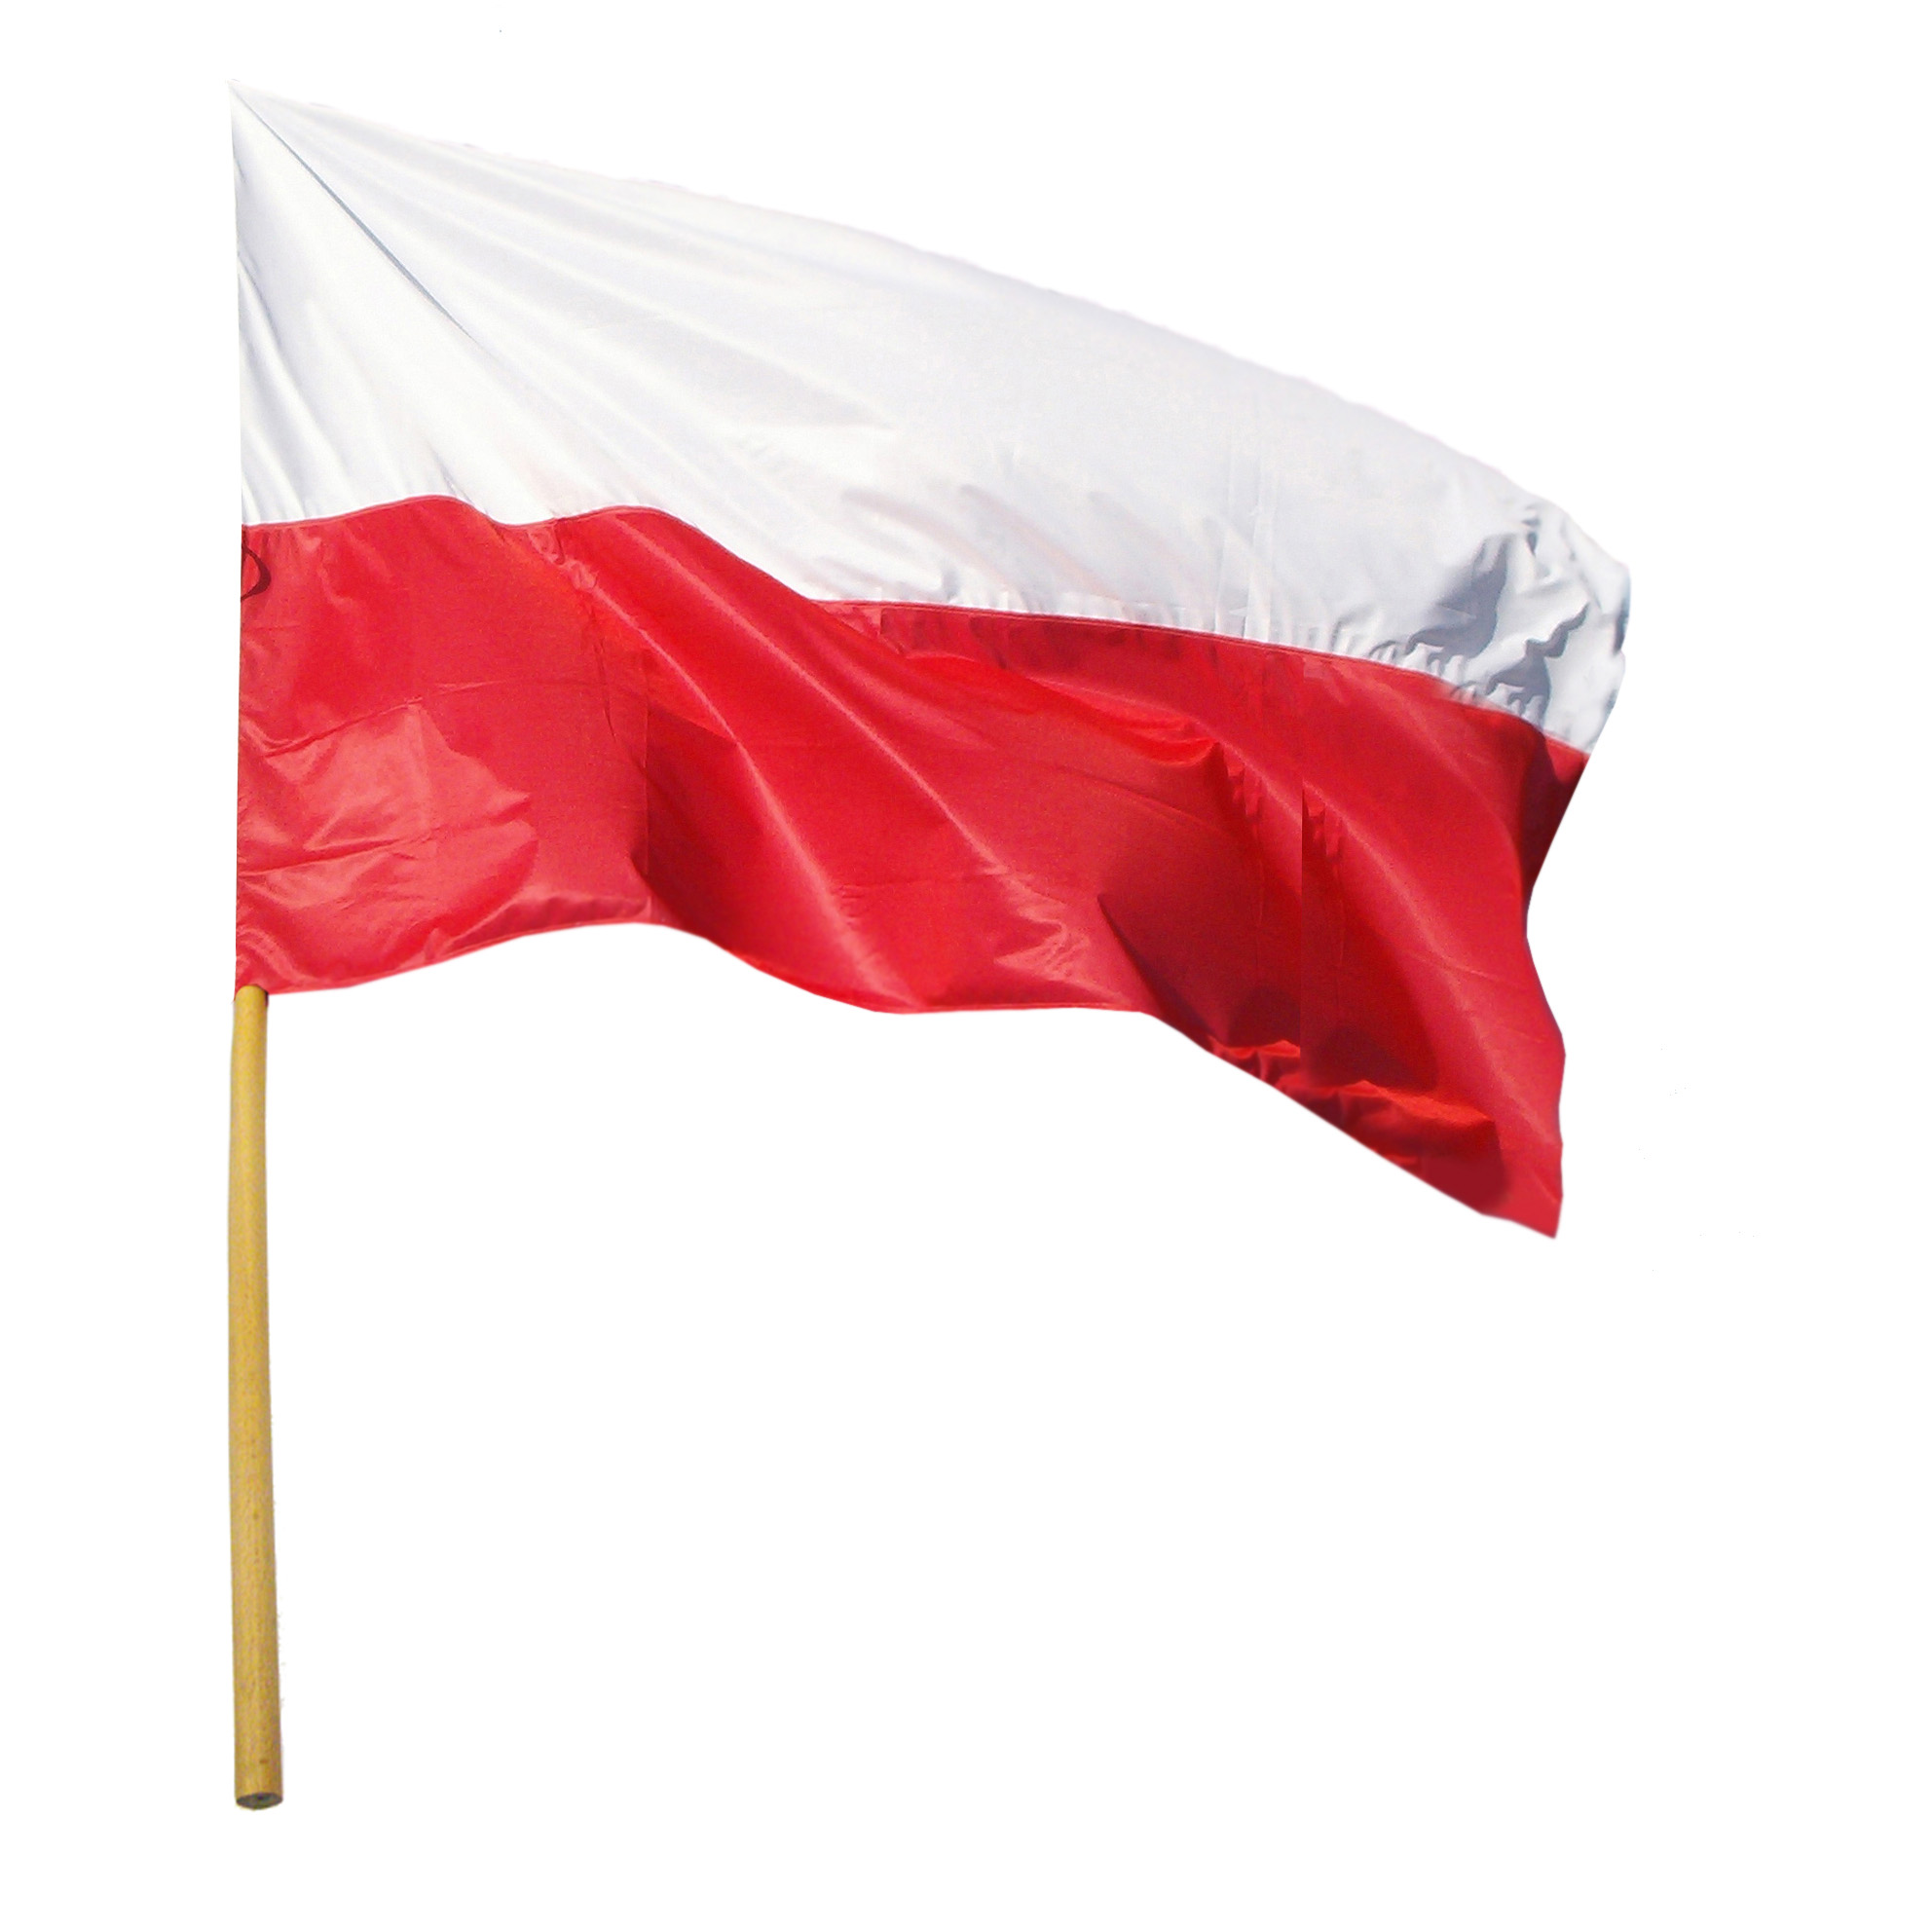 Flaga polski - państwowa, flagi - BHPVota